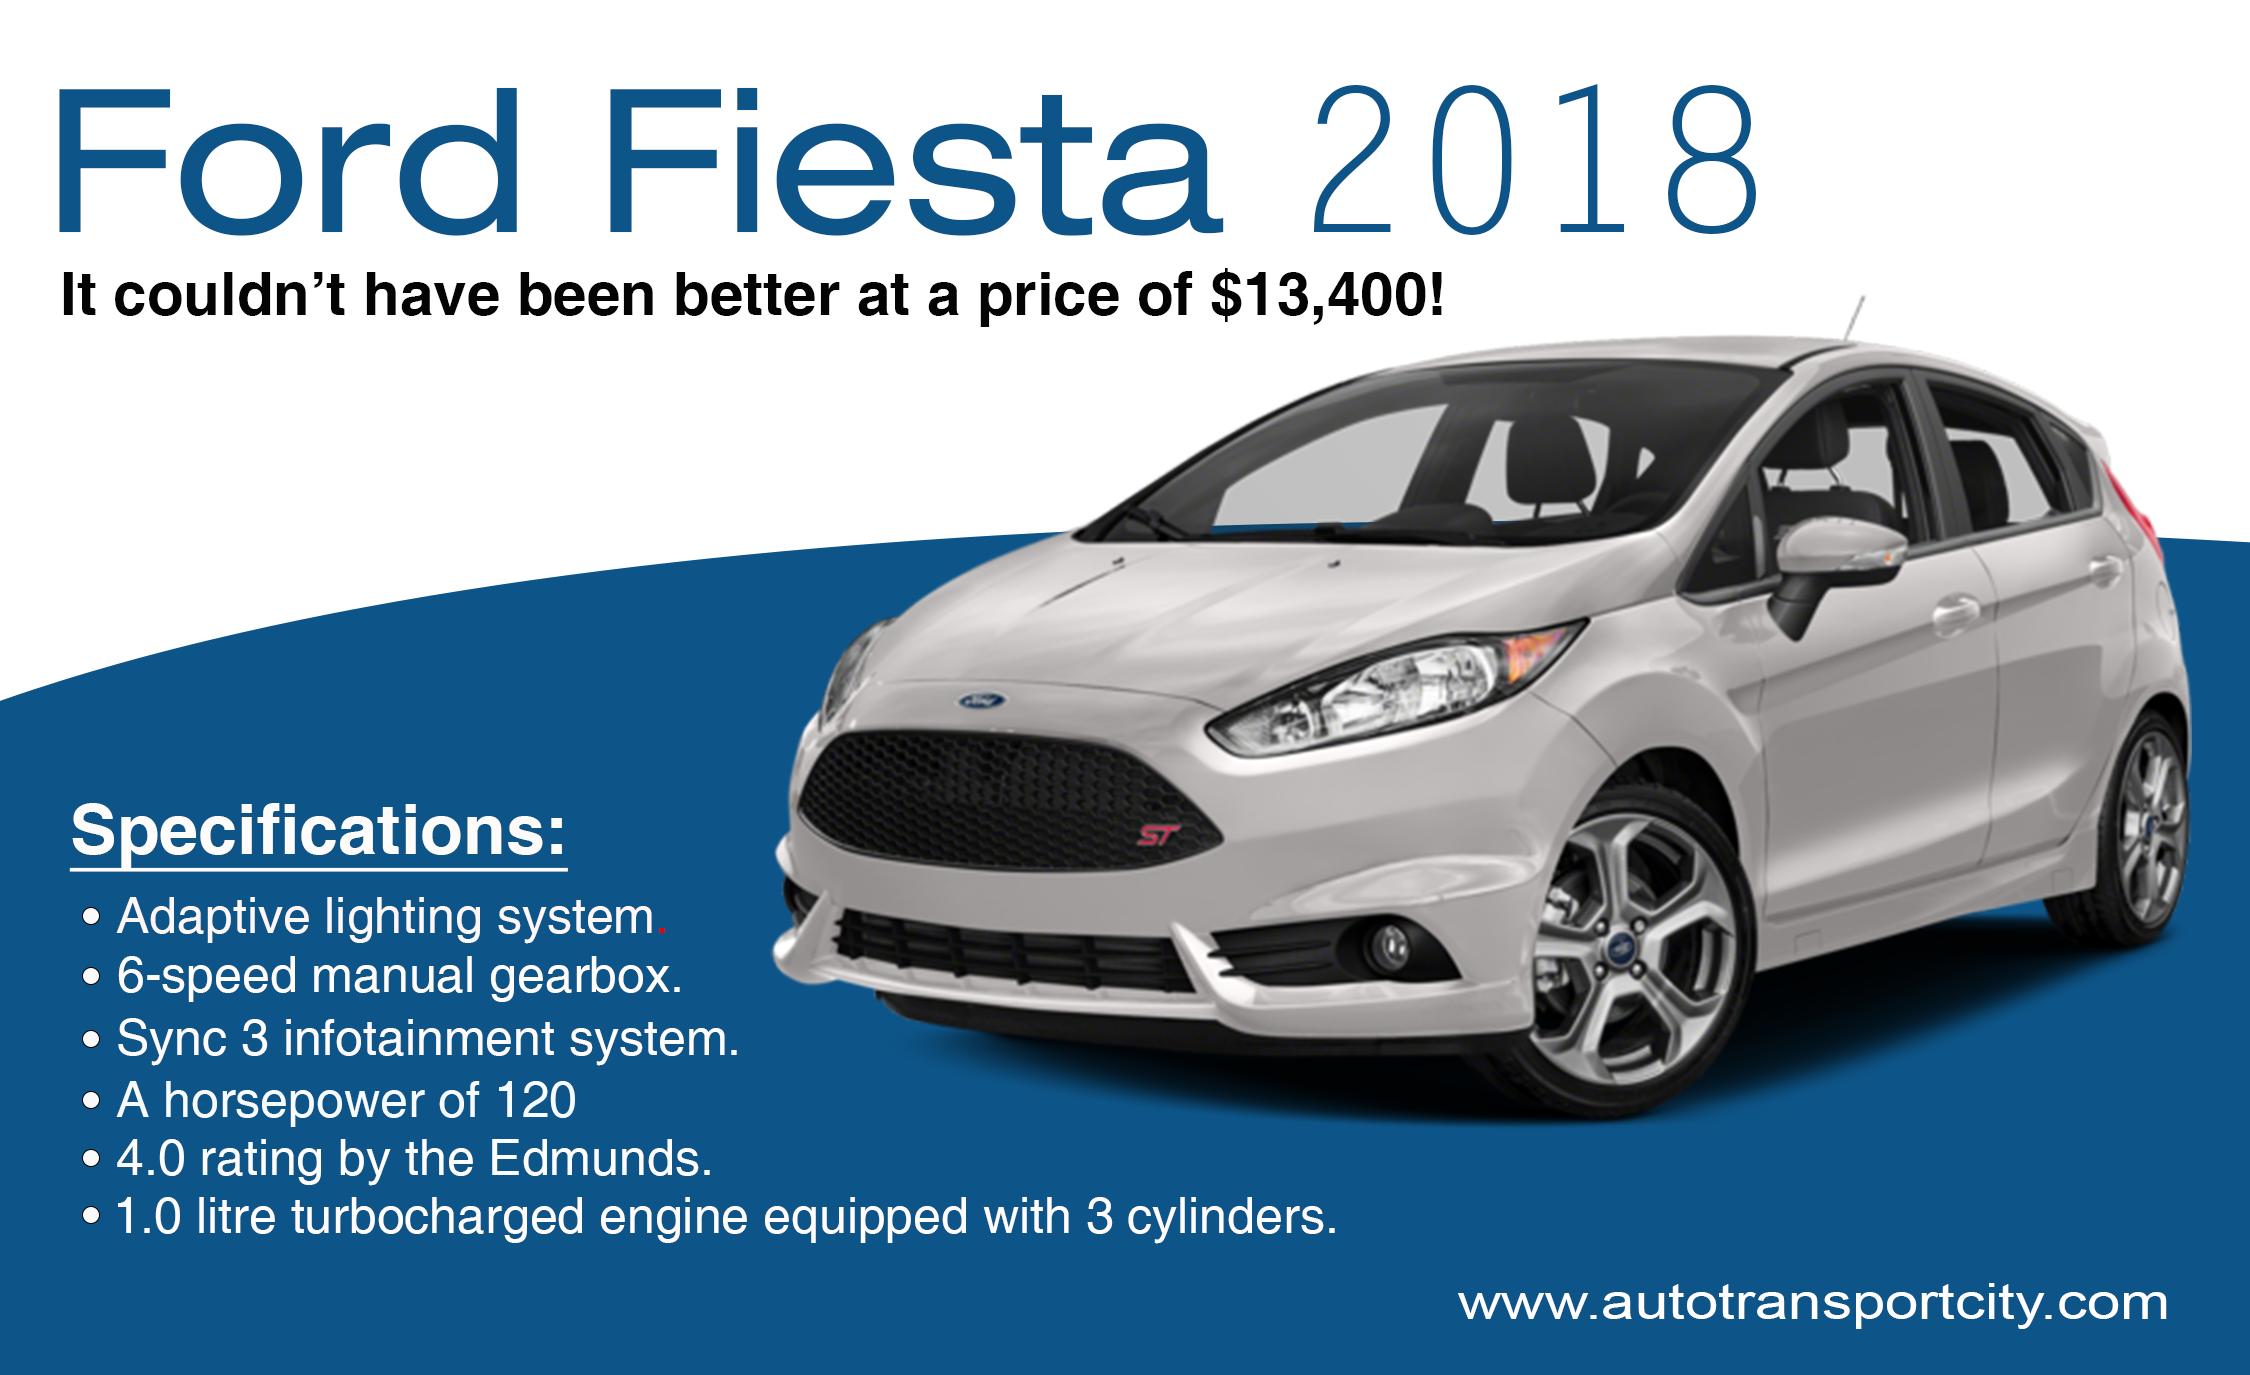 Ford-Fiesta-2018